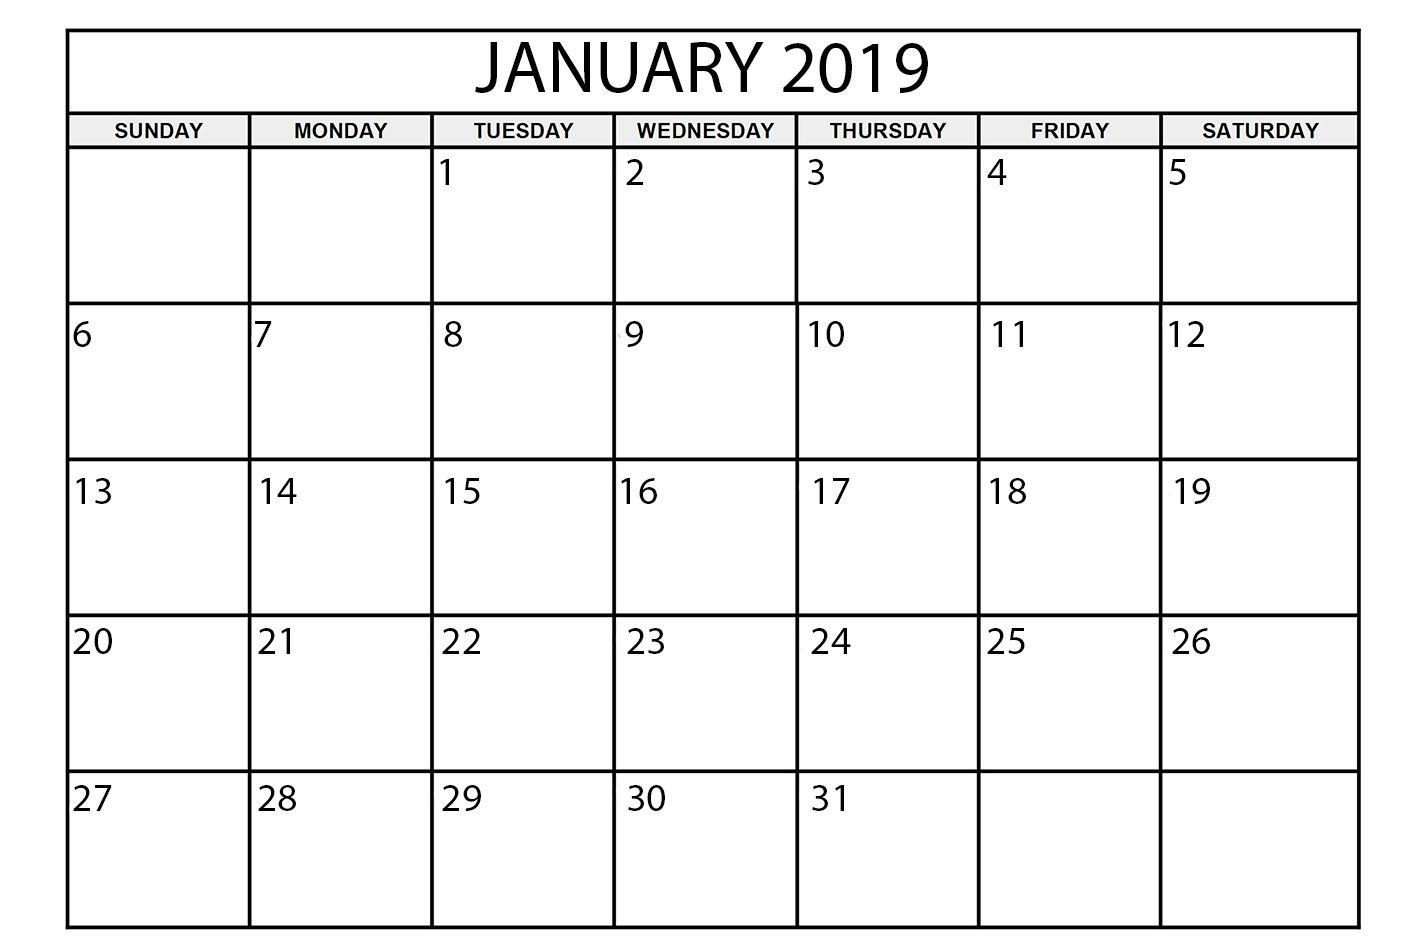 Free Printable Calendar January 2019 | Academic Calendar